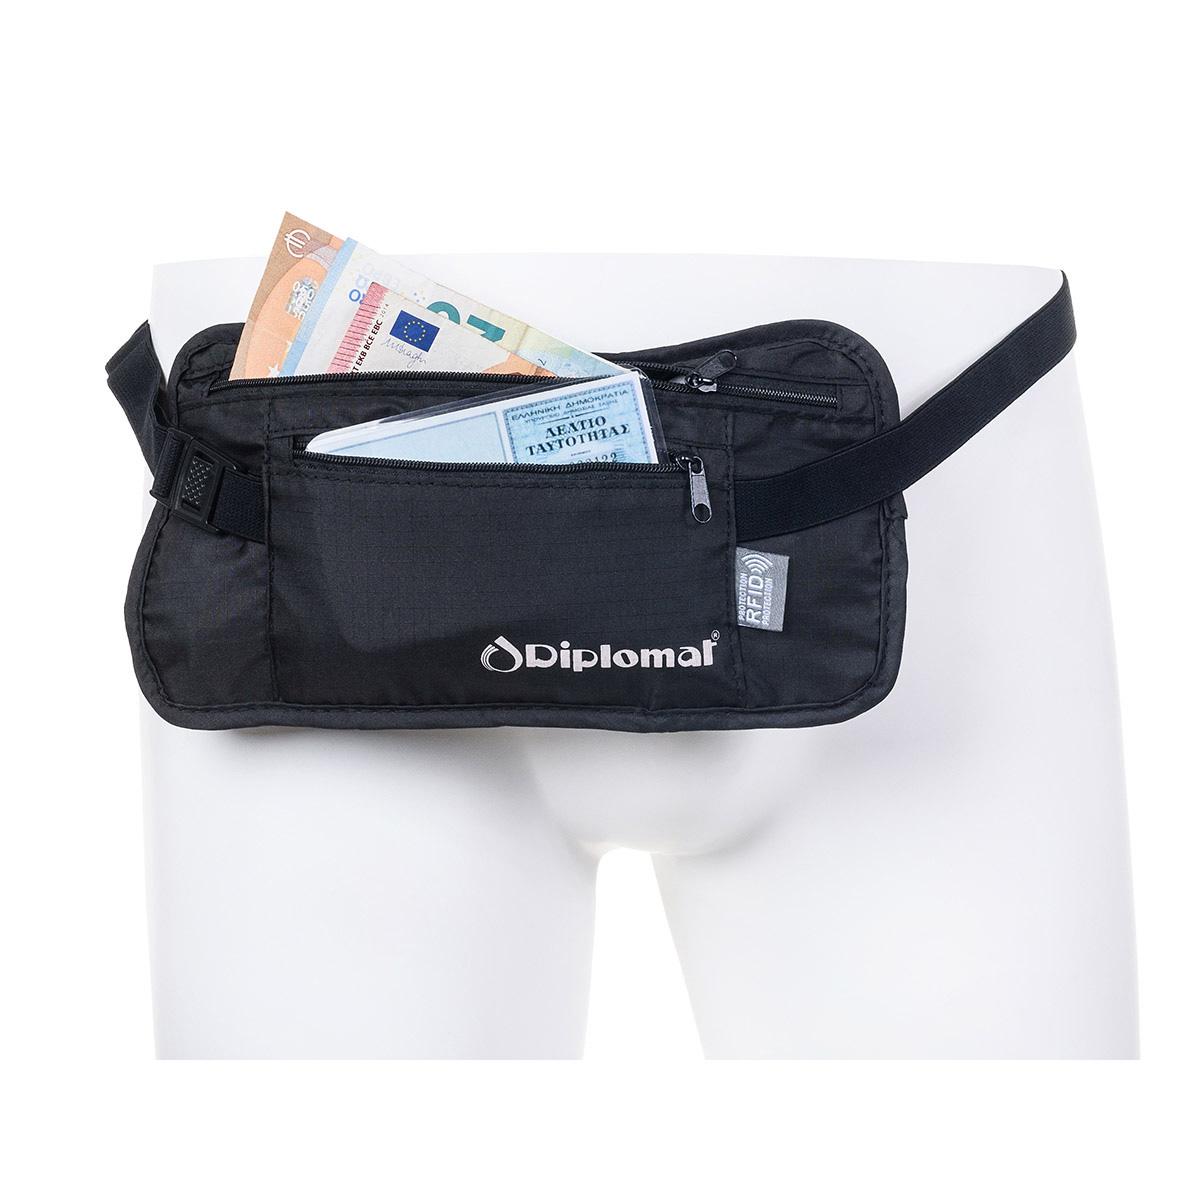 ddc1ec78f5 Εσωτερικό Τσαντάκι Μέσης Ταξιδιού Εγγράφων-Χρημάτων Με RFID Προστασία Diplomat  Acsec Μαύρο